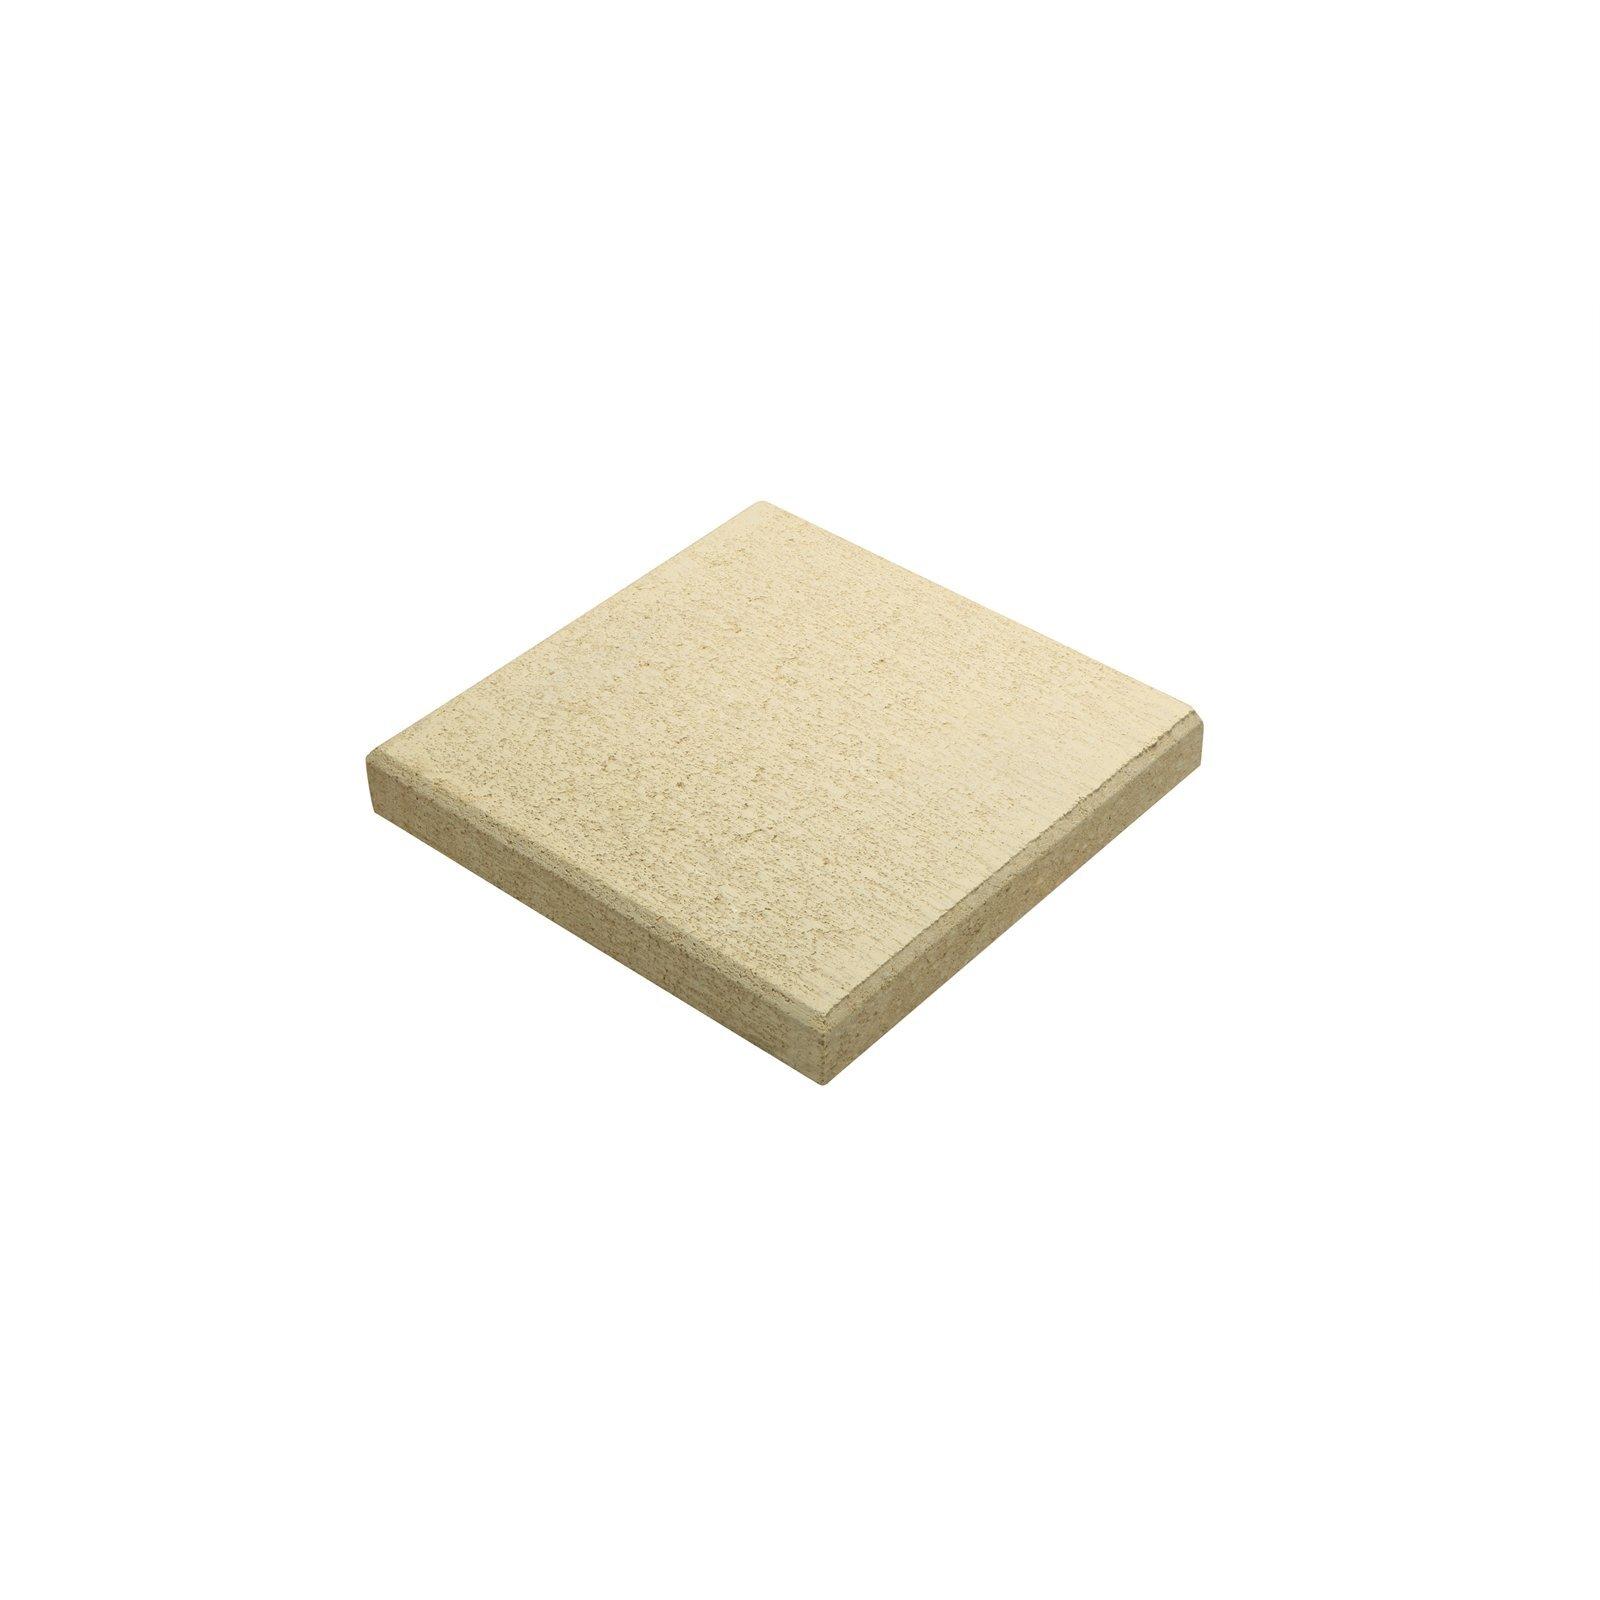 Brighton Masonry 200 x 200 x 40mm Sand Mypave Paver